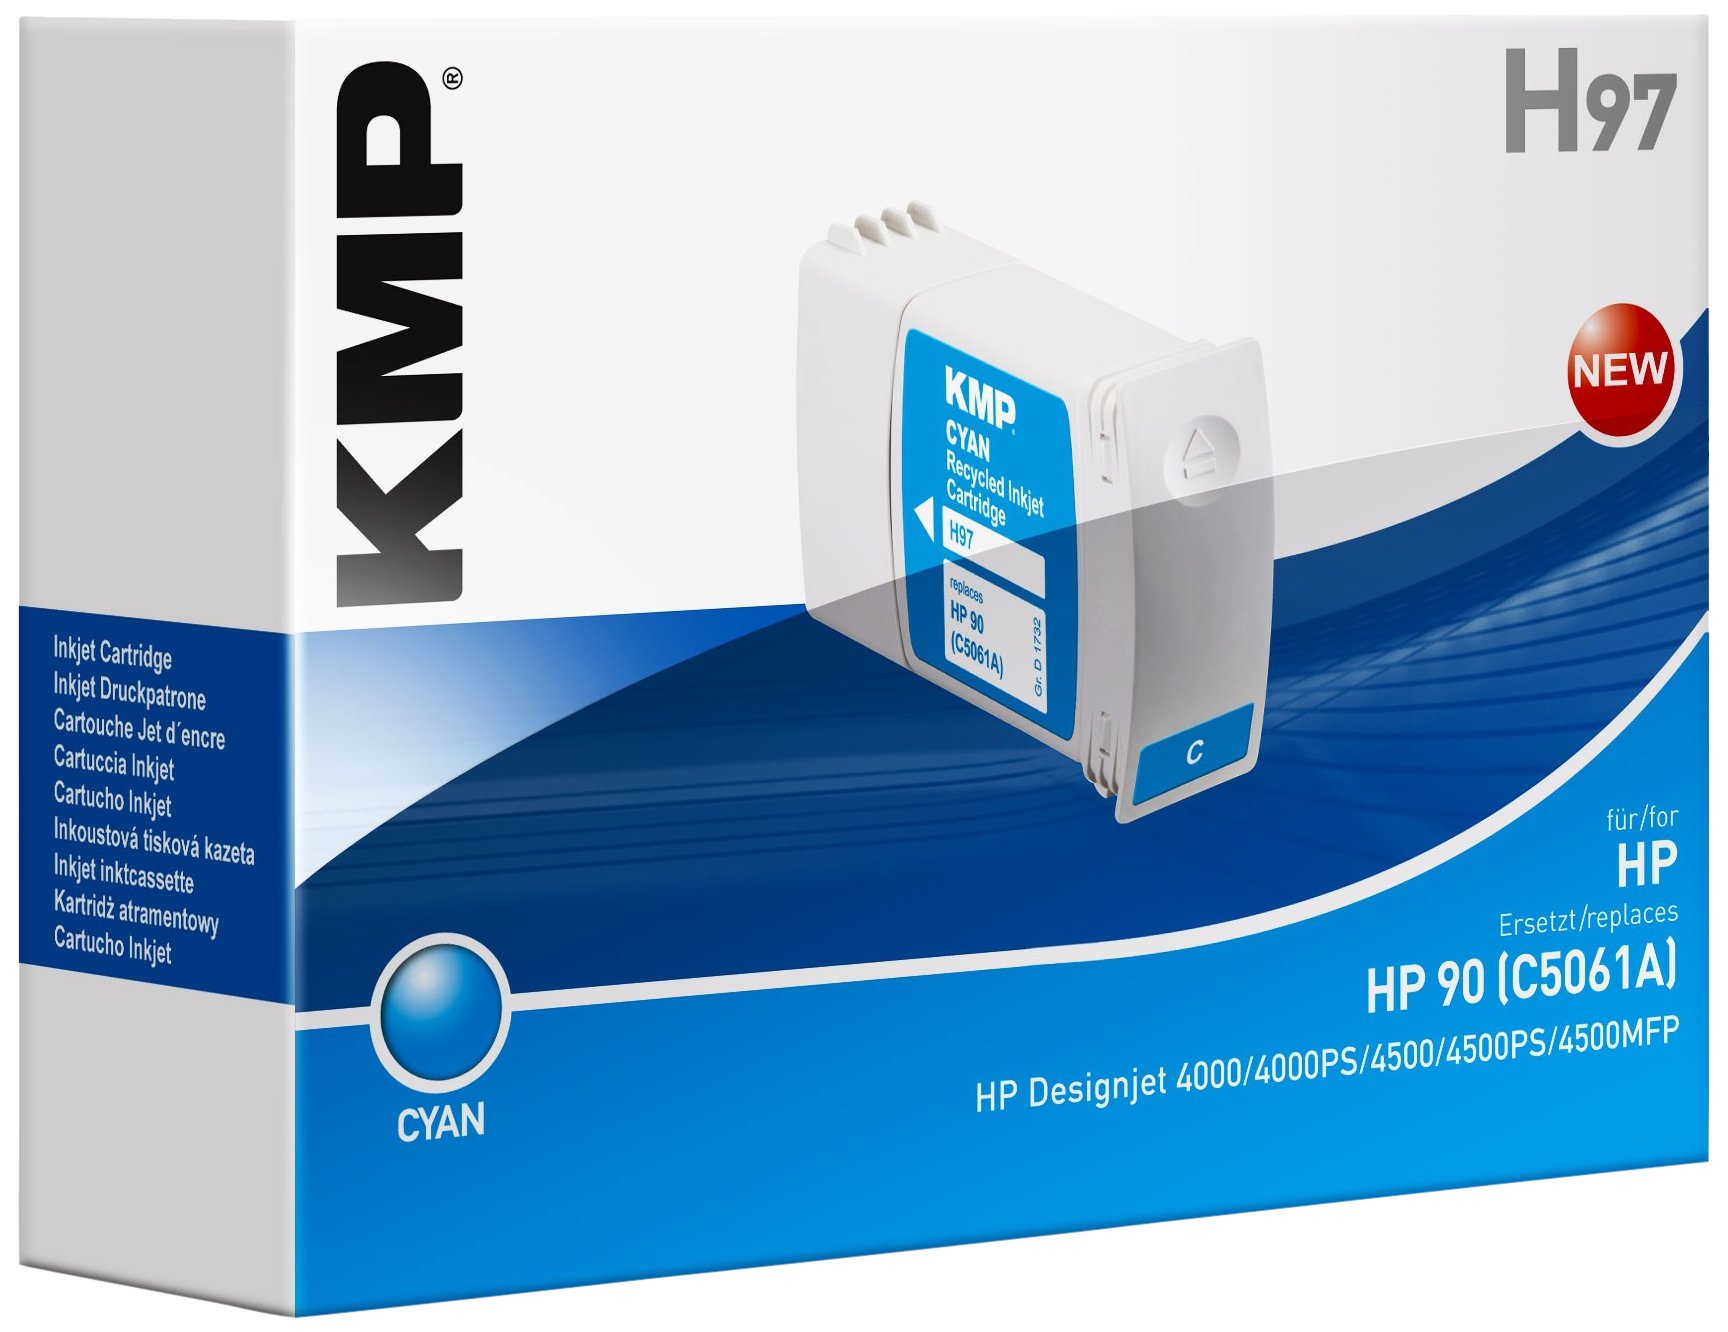 KMP 1732,4003 cartucho de tinta Cian 1 pieza(s) - Cartucho de tinta para impresoras (Cian, HP DesignJet 4000 PS HP DesignJet 4000 Series HP DesignJet 4020 42 Inch HP DesignJet 4020 PS